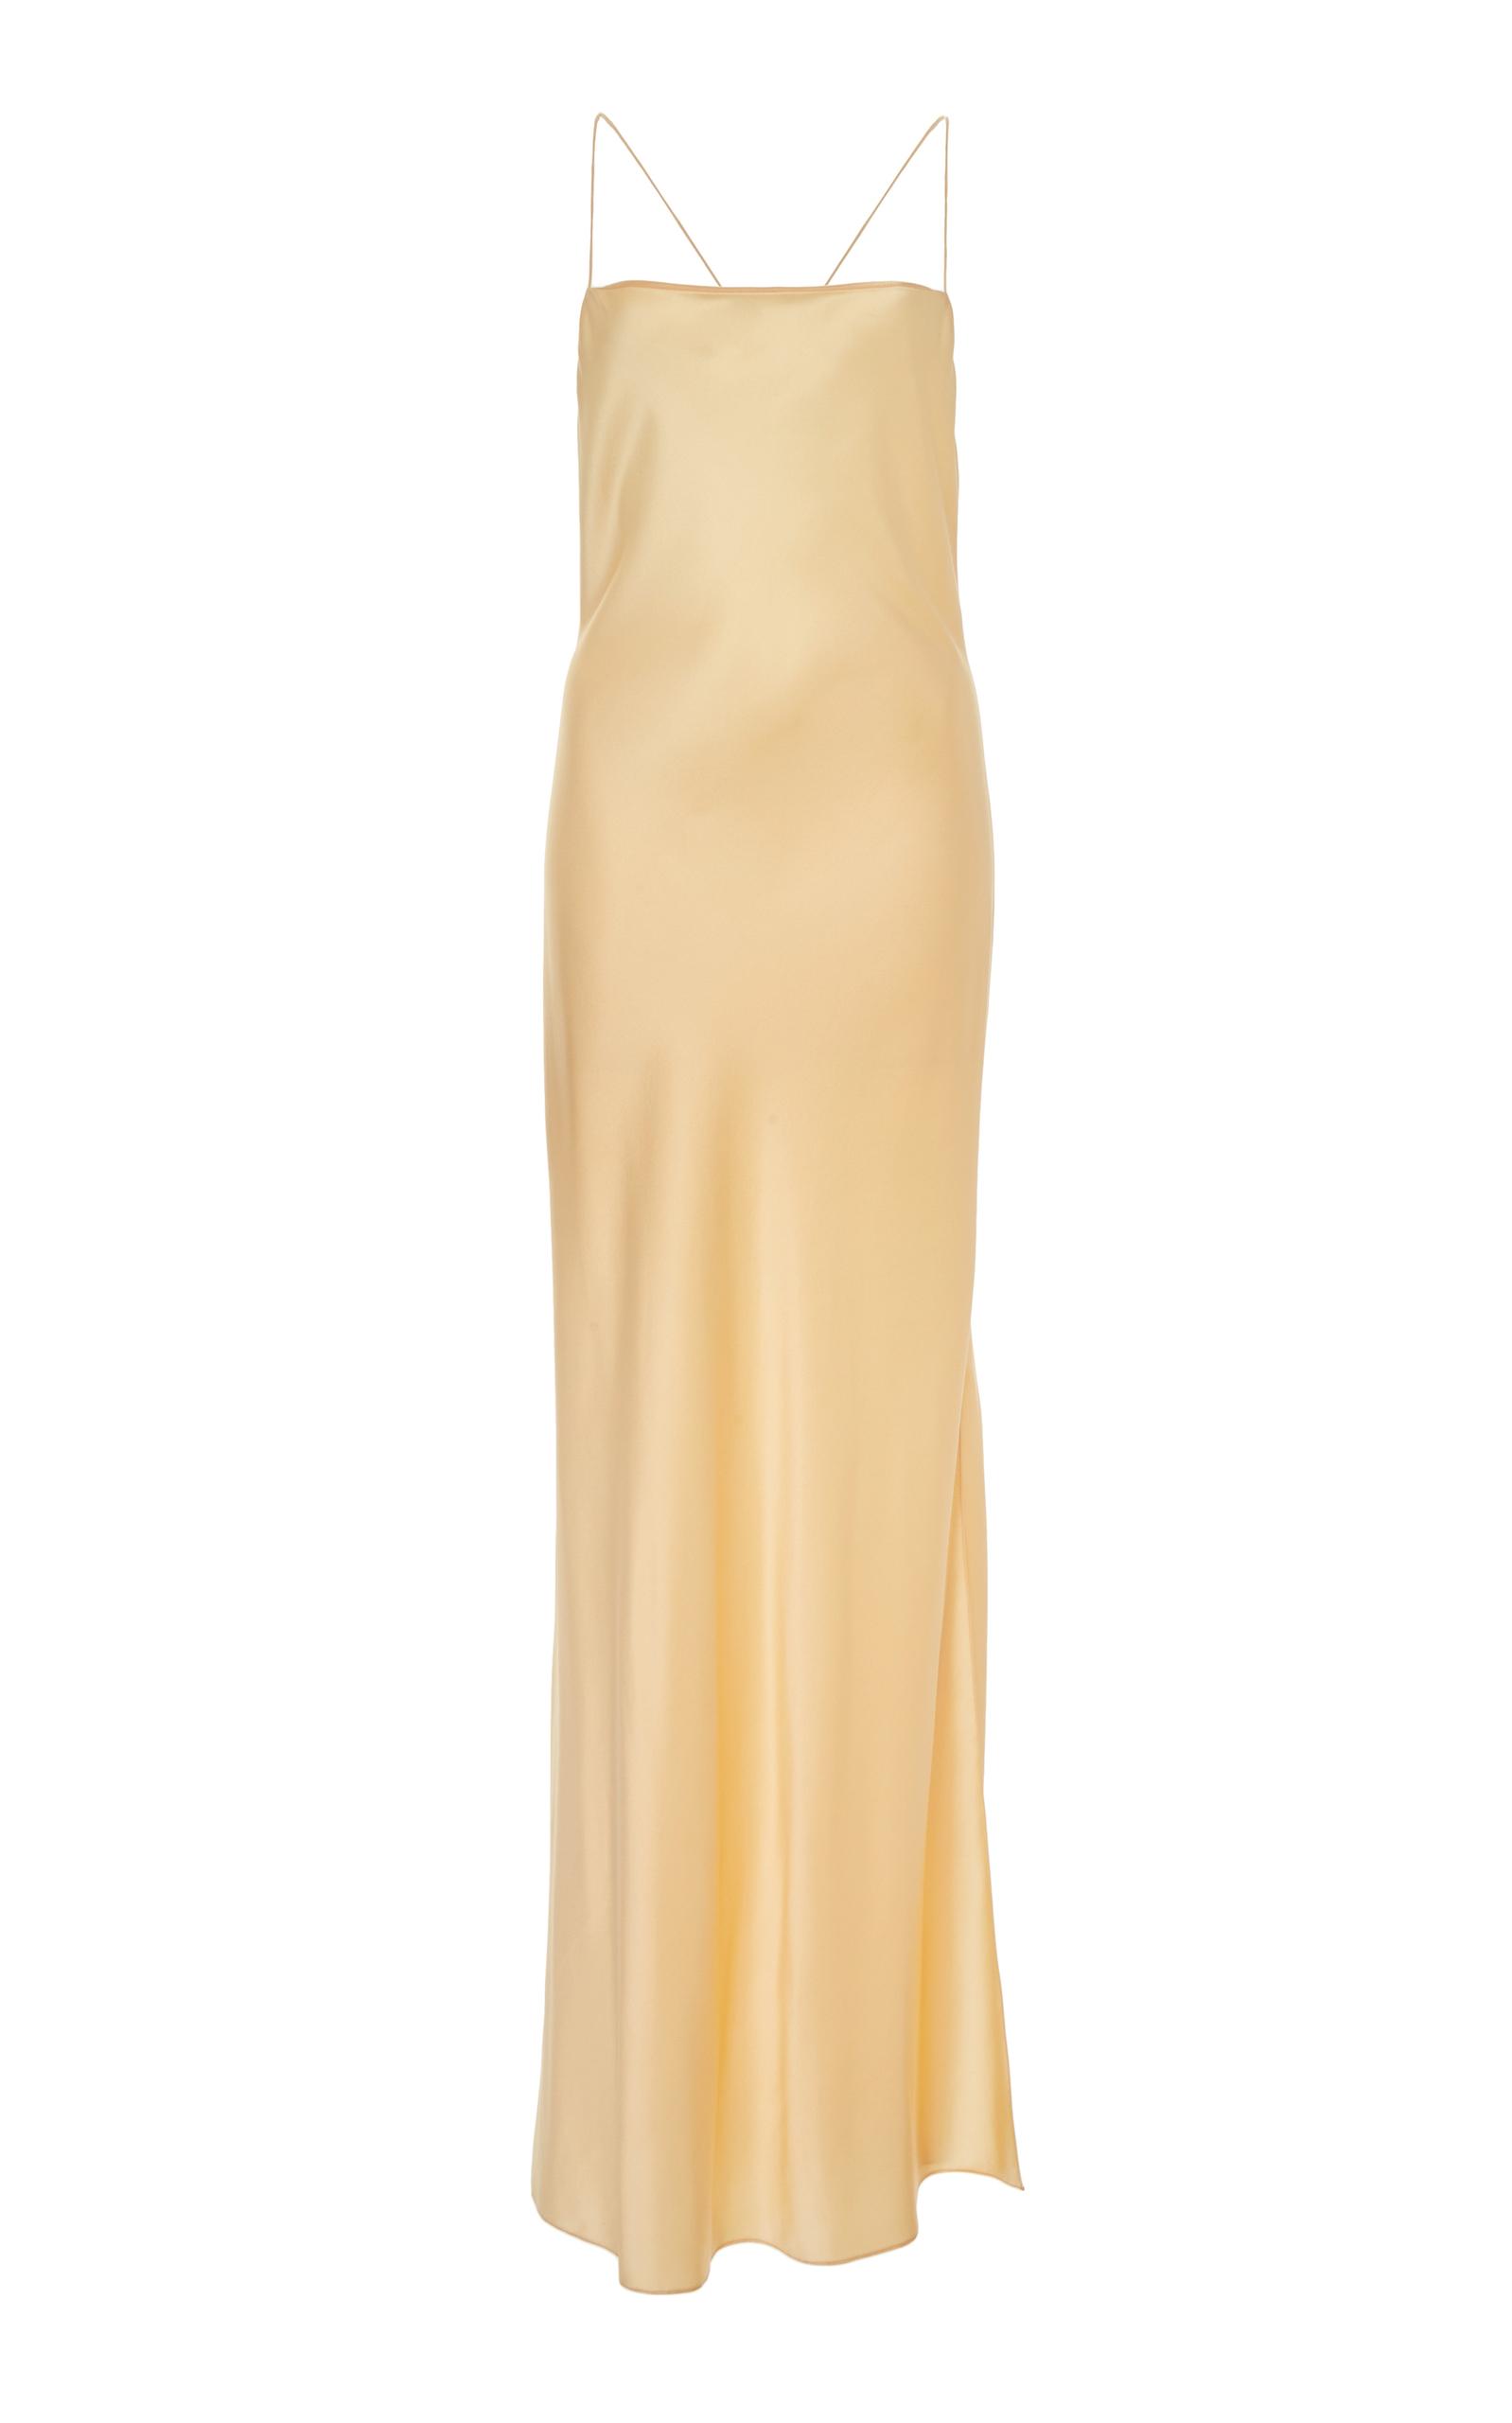 Buy Marina Moscone Satin Slip Dress online, shop Marina Moscone at the best price